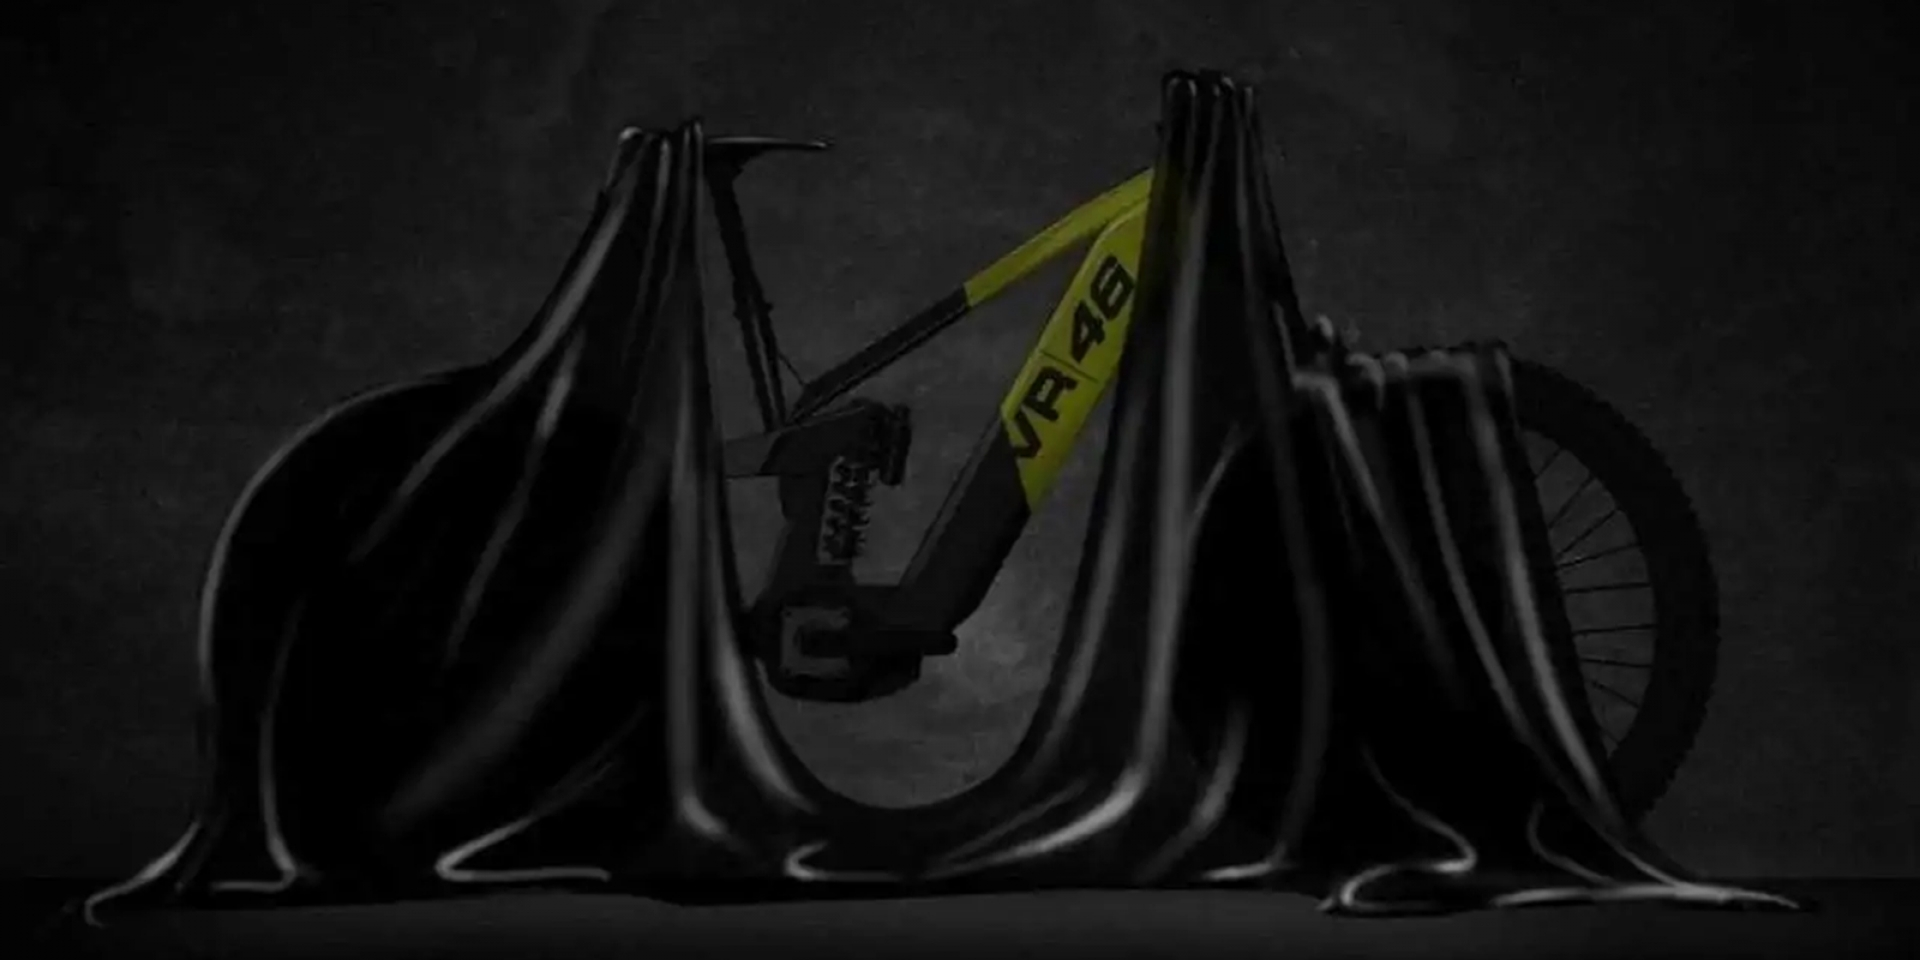 Rossi也出電動車?VR46 e-MTB電動自行車,11月米蘭車展發表!